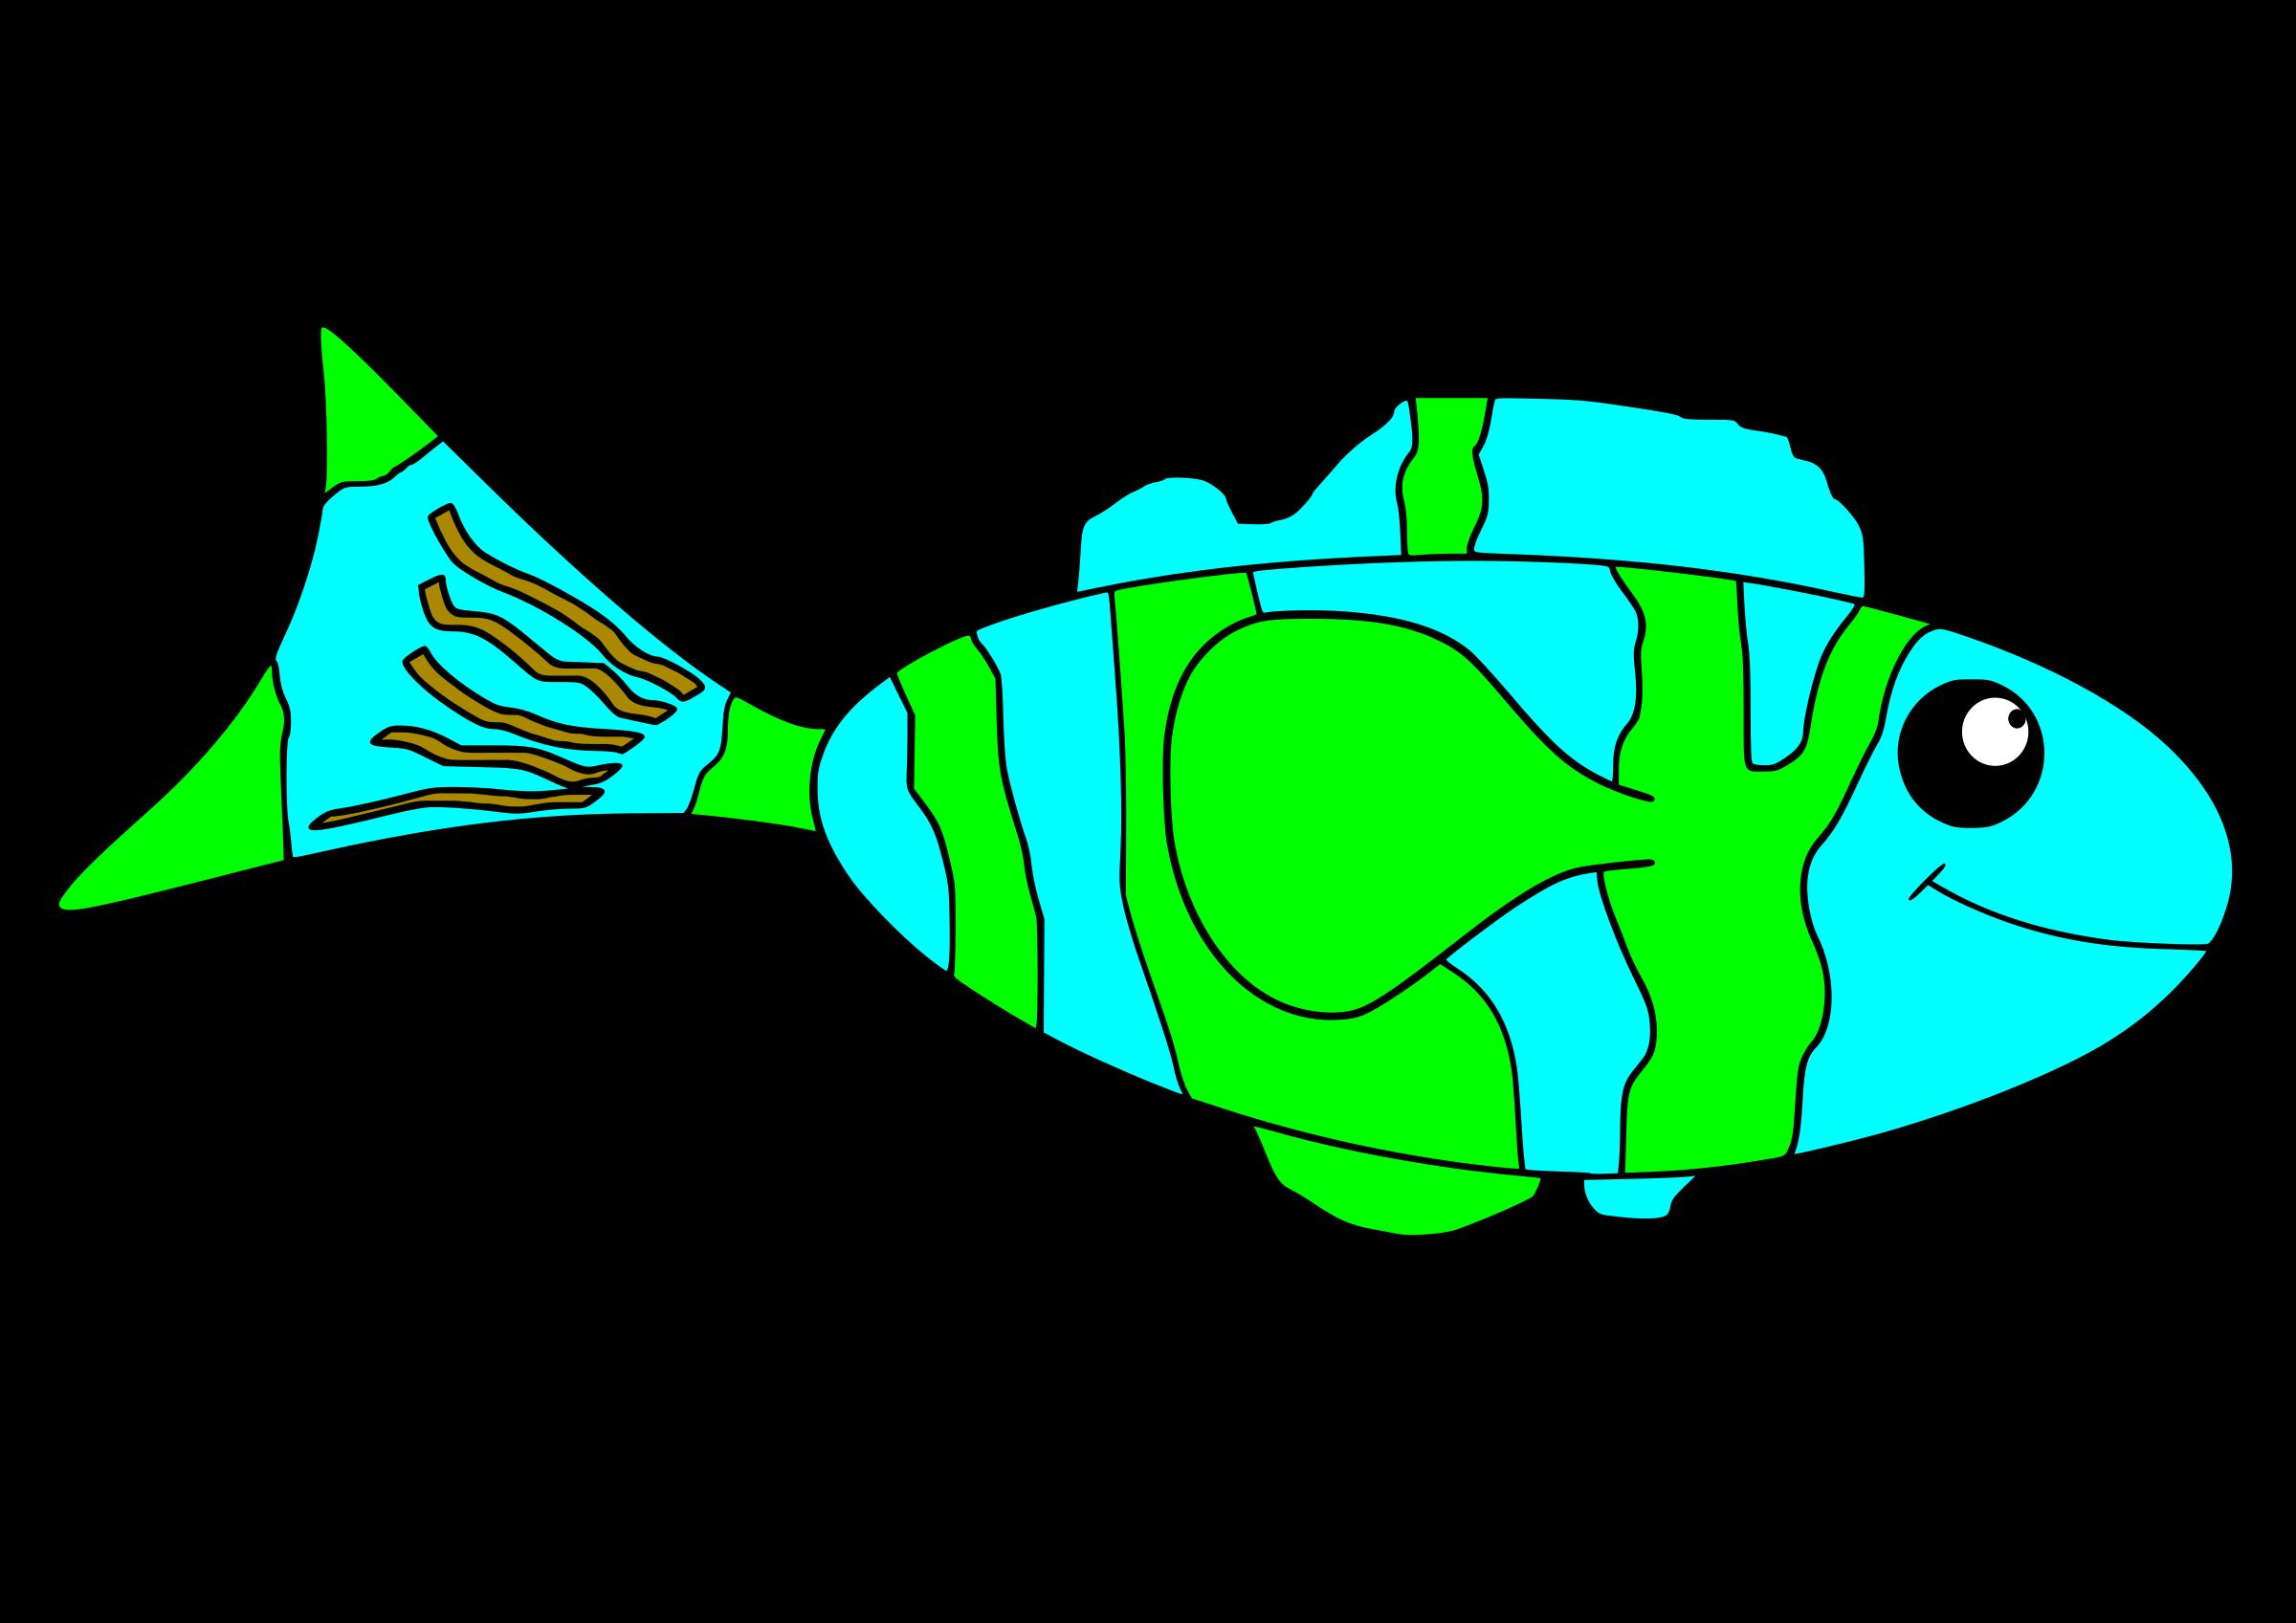 Clipart fish teal. Happy big image png